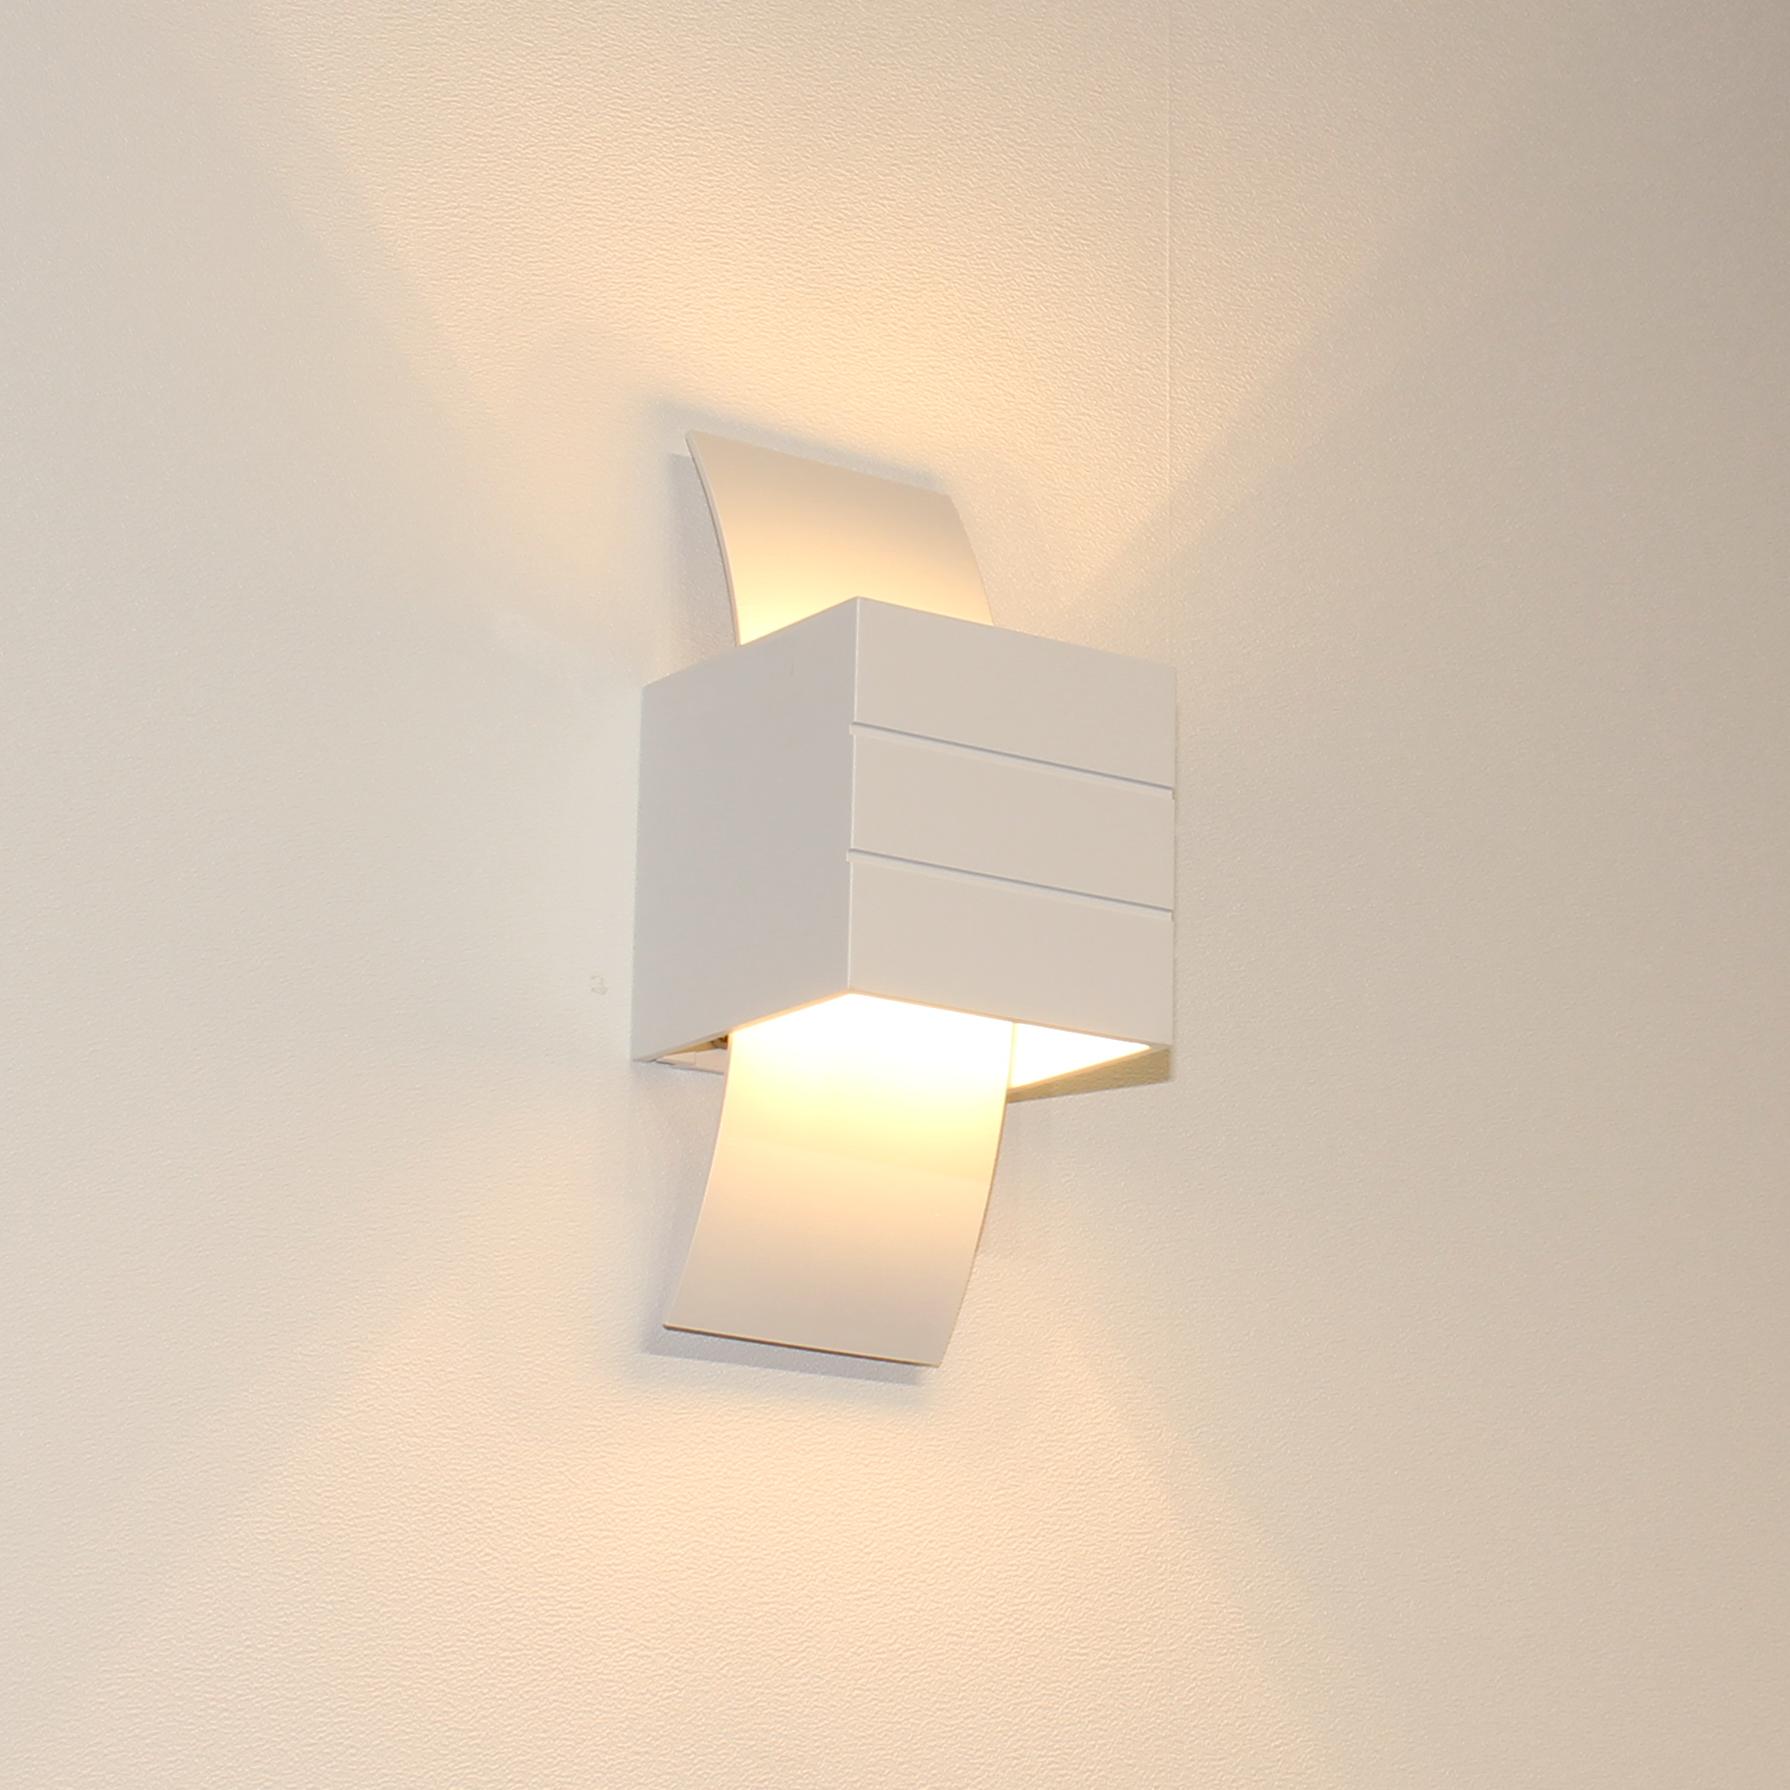 Artdelight Wandlamp Gyhum H 20 cm B 8 cm excl. G9 wit